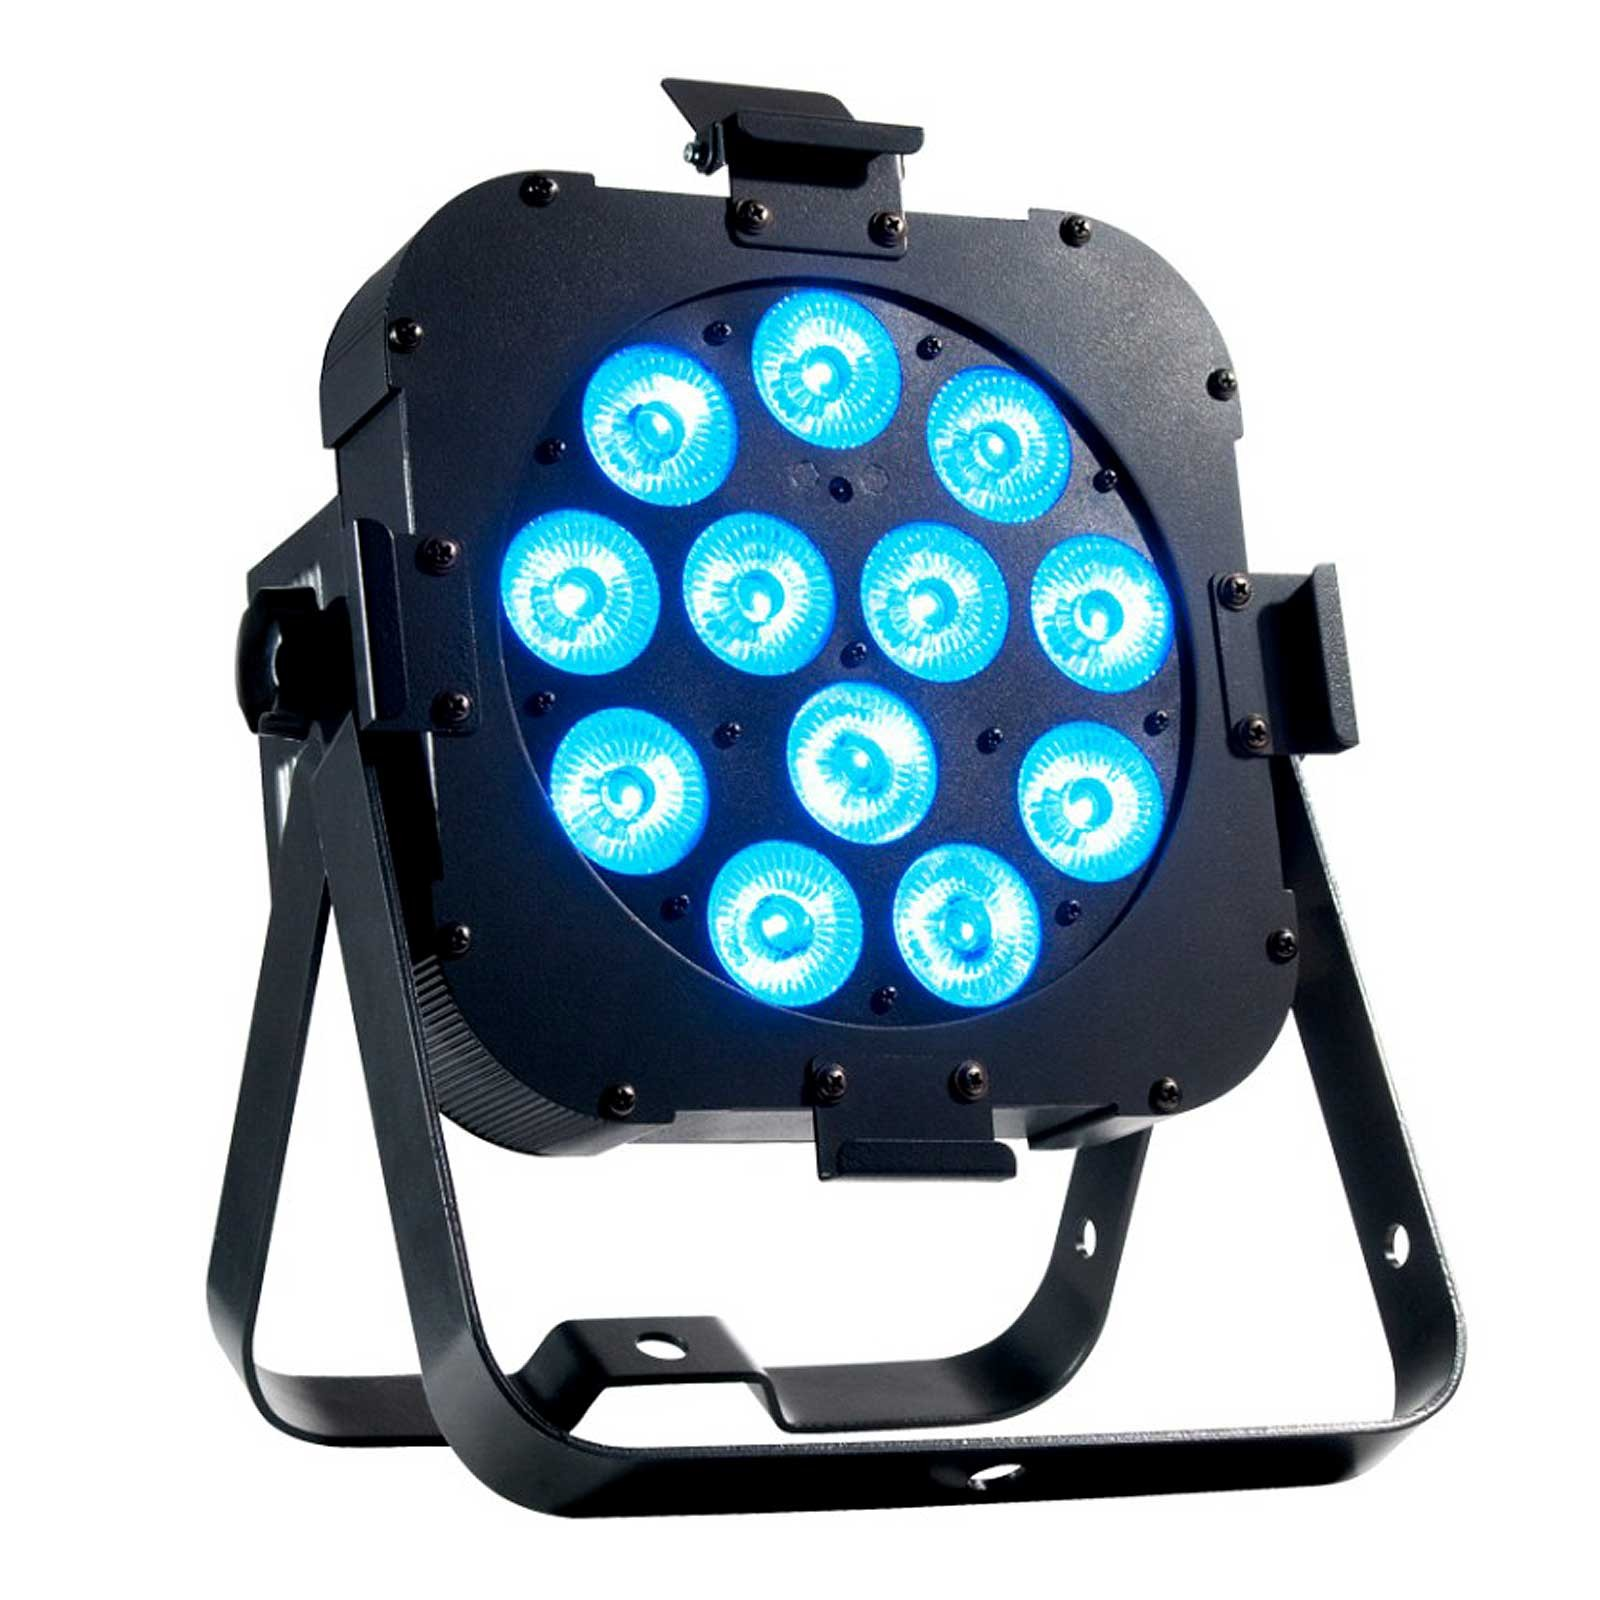 lighting-equipment-for-sale-led-fixtures-led-moving-light-fixtures-adj-flat-par-led-black.jpg